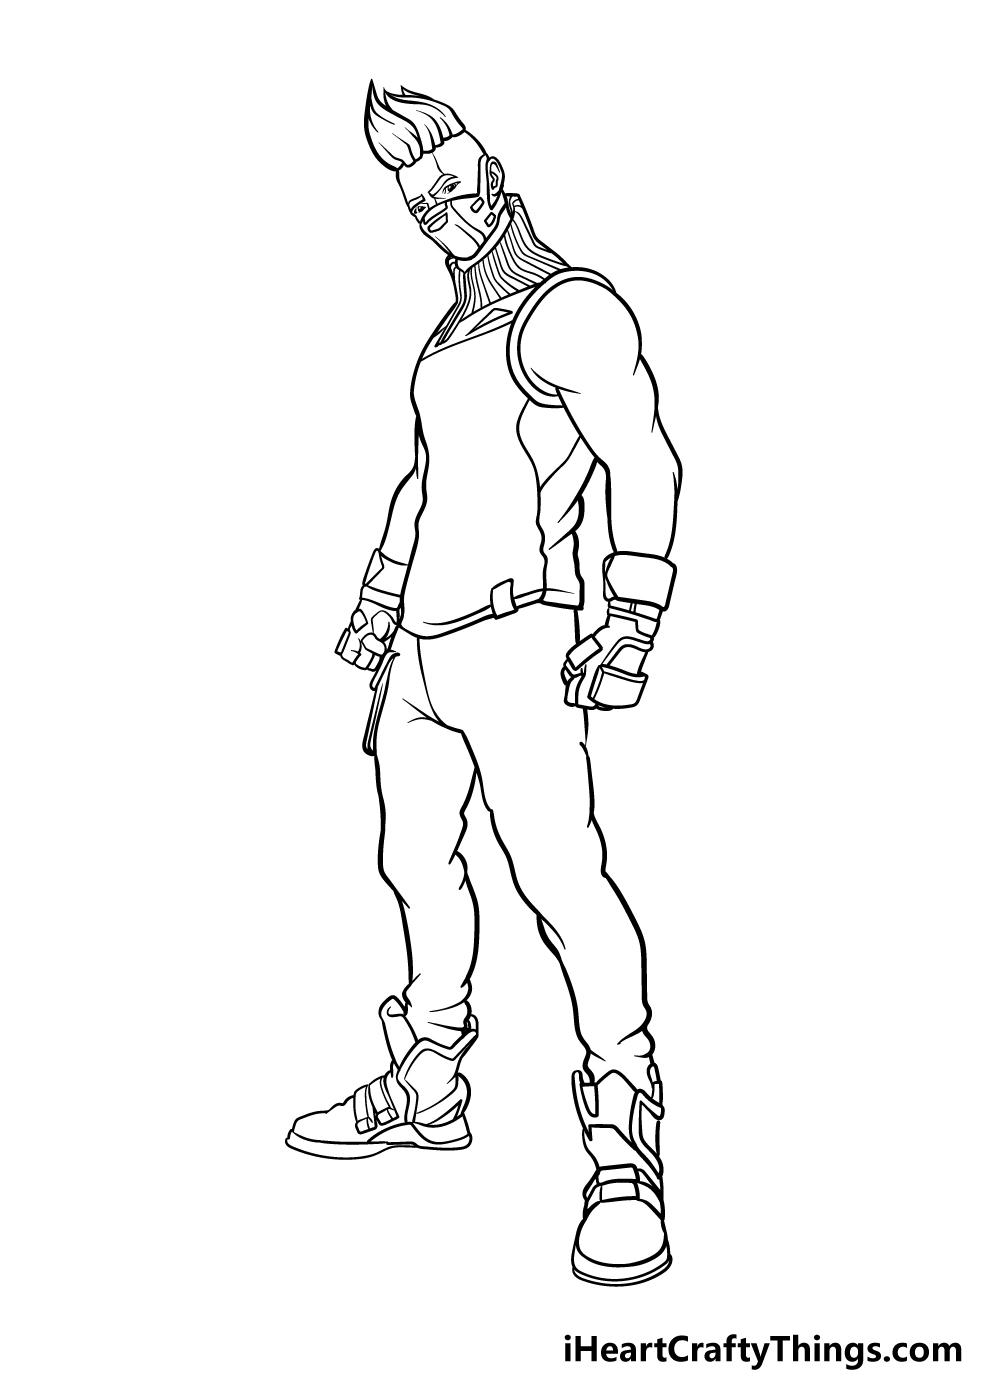 fortnite drawing step 9